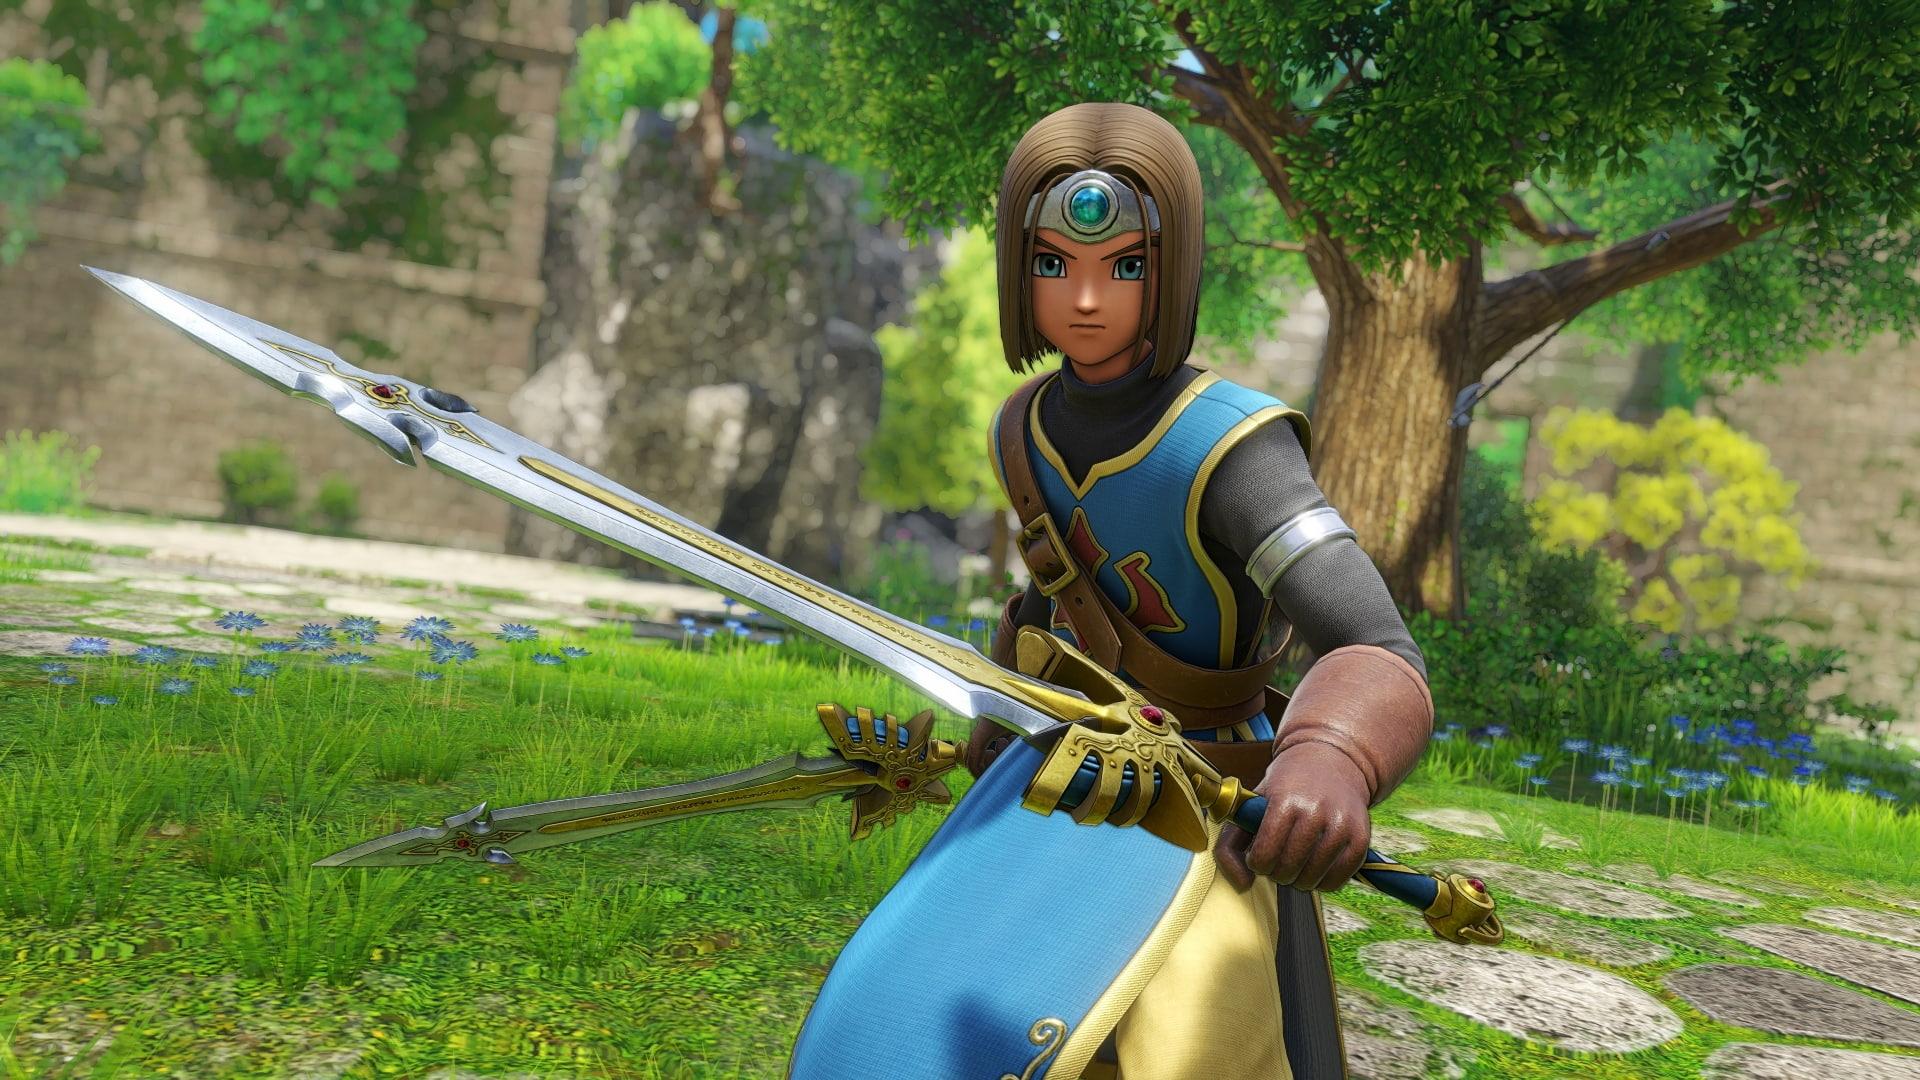 Video Game Dragon Quest Xi Dragon Quest Xi 4k 1497523 Hd